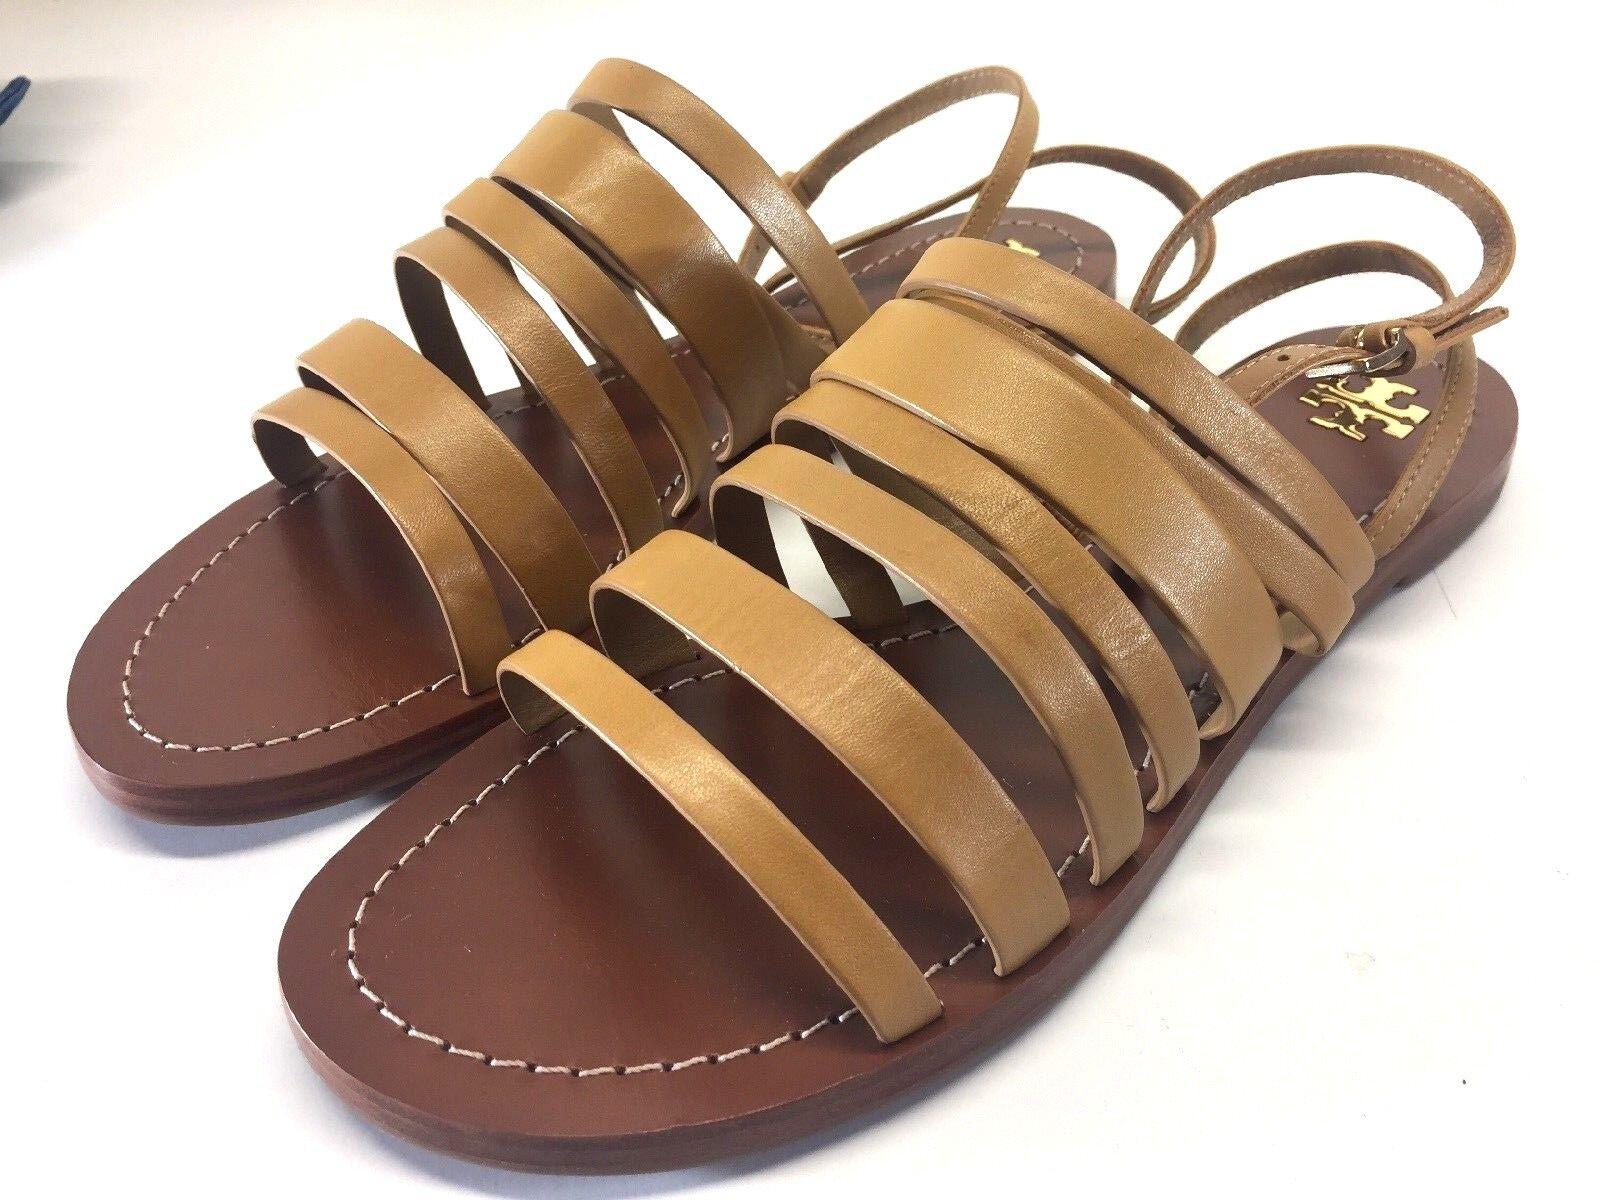 New Tory Birch Birch Birch Patos Ankle Strap US 11 EU 41 Sandals Navy Blond Flats scarpe Logo 9ed1cd